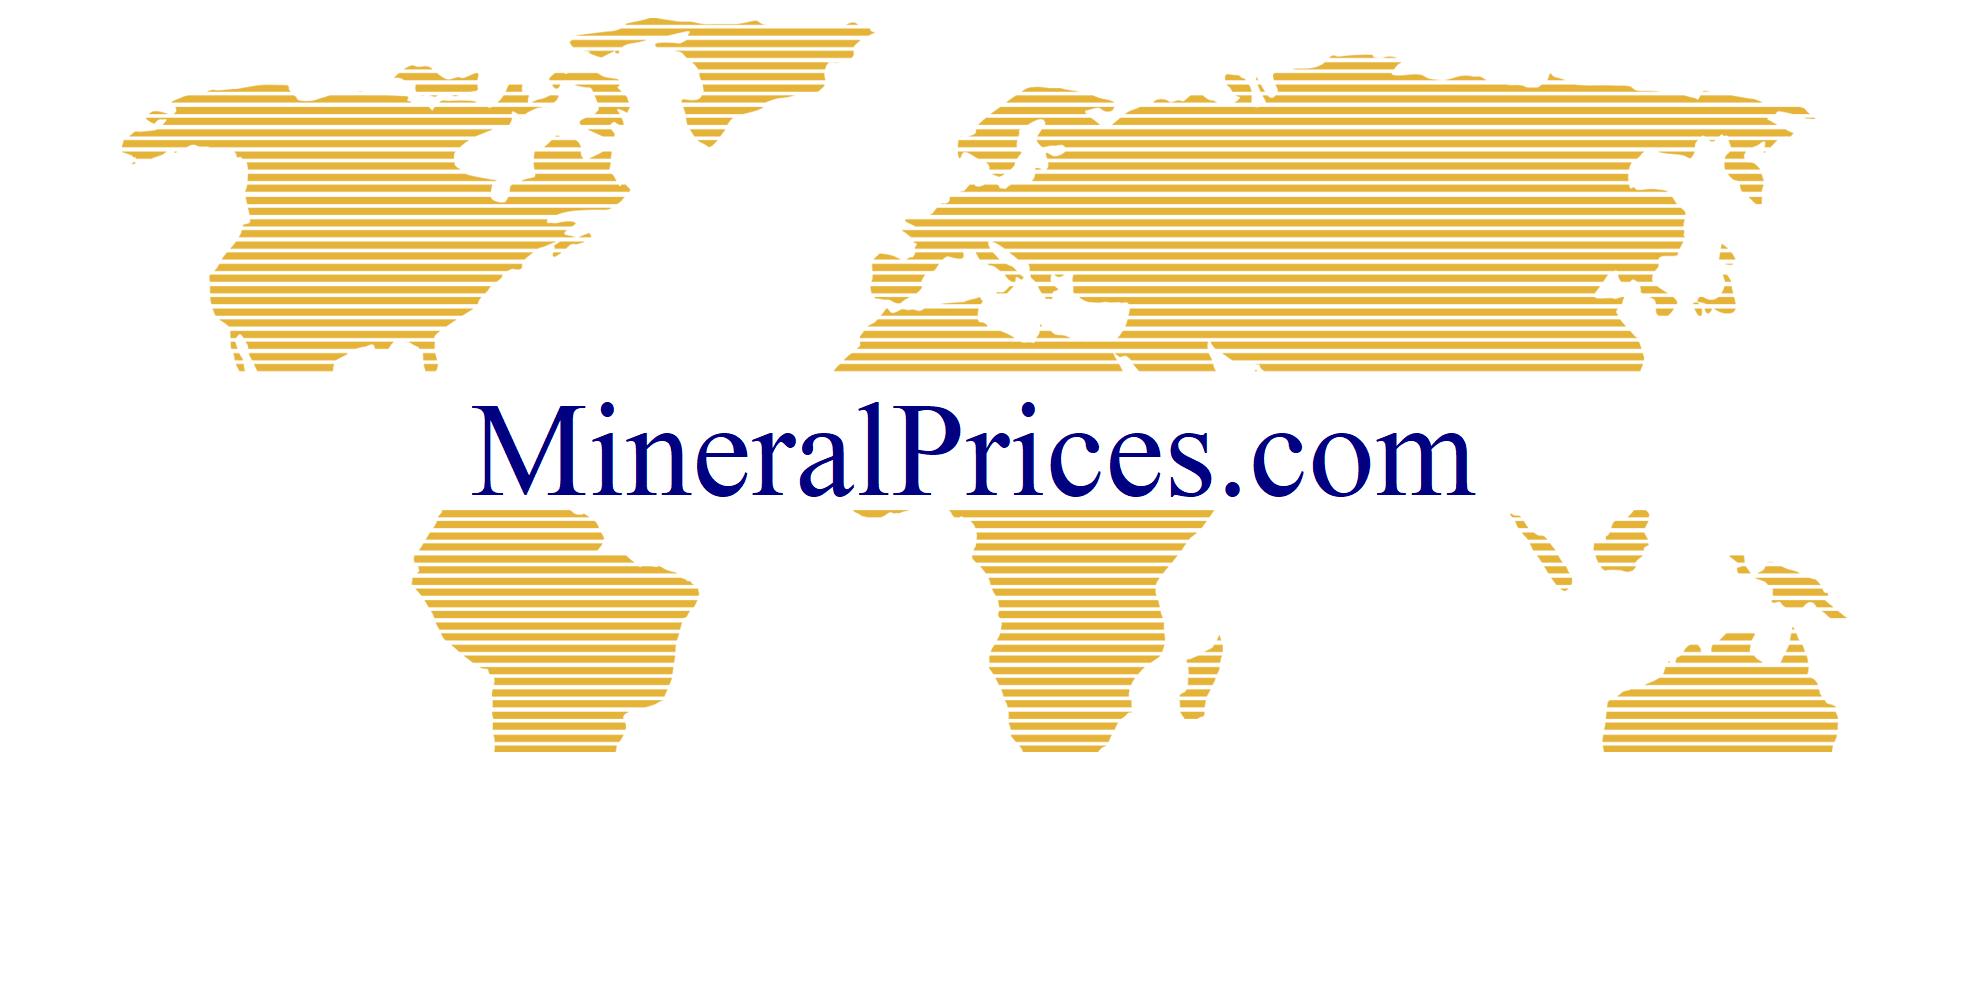 MineralPrices.com